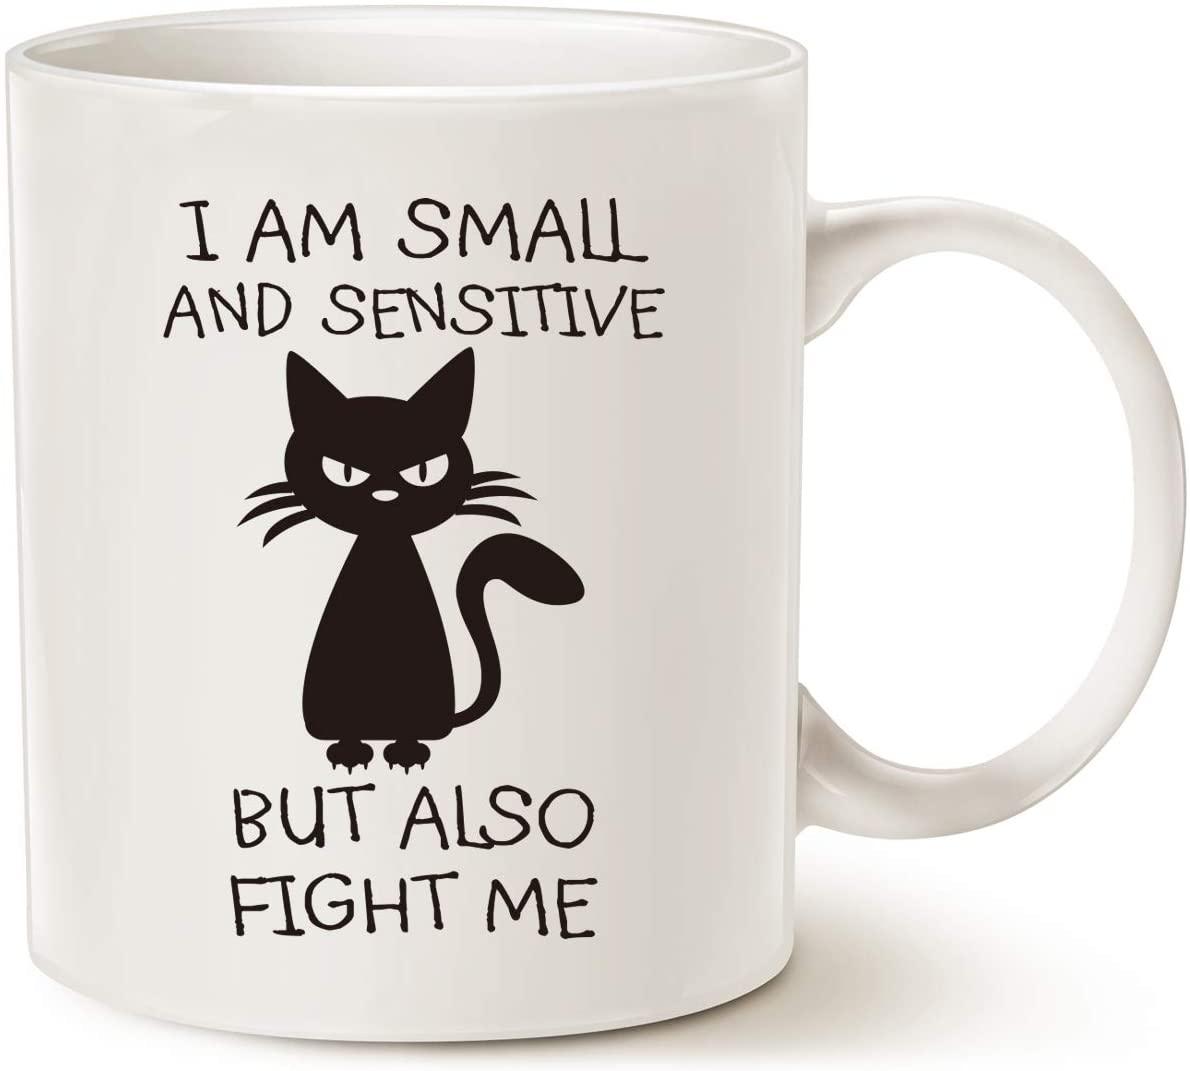 MAUAG Funny Quote Coffee Mug Christmas Gifts, Birthday Gag Gift Ideas for Friend Cup, White 11 Oz